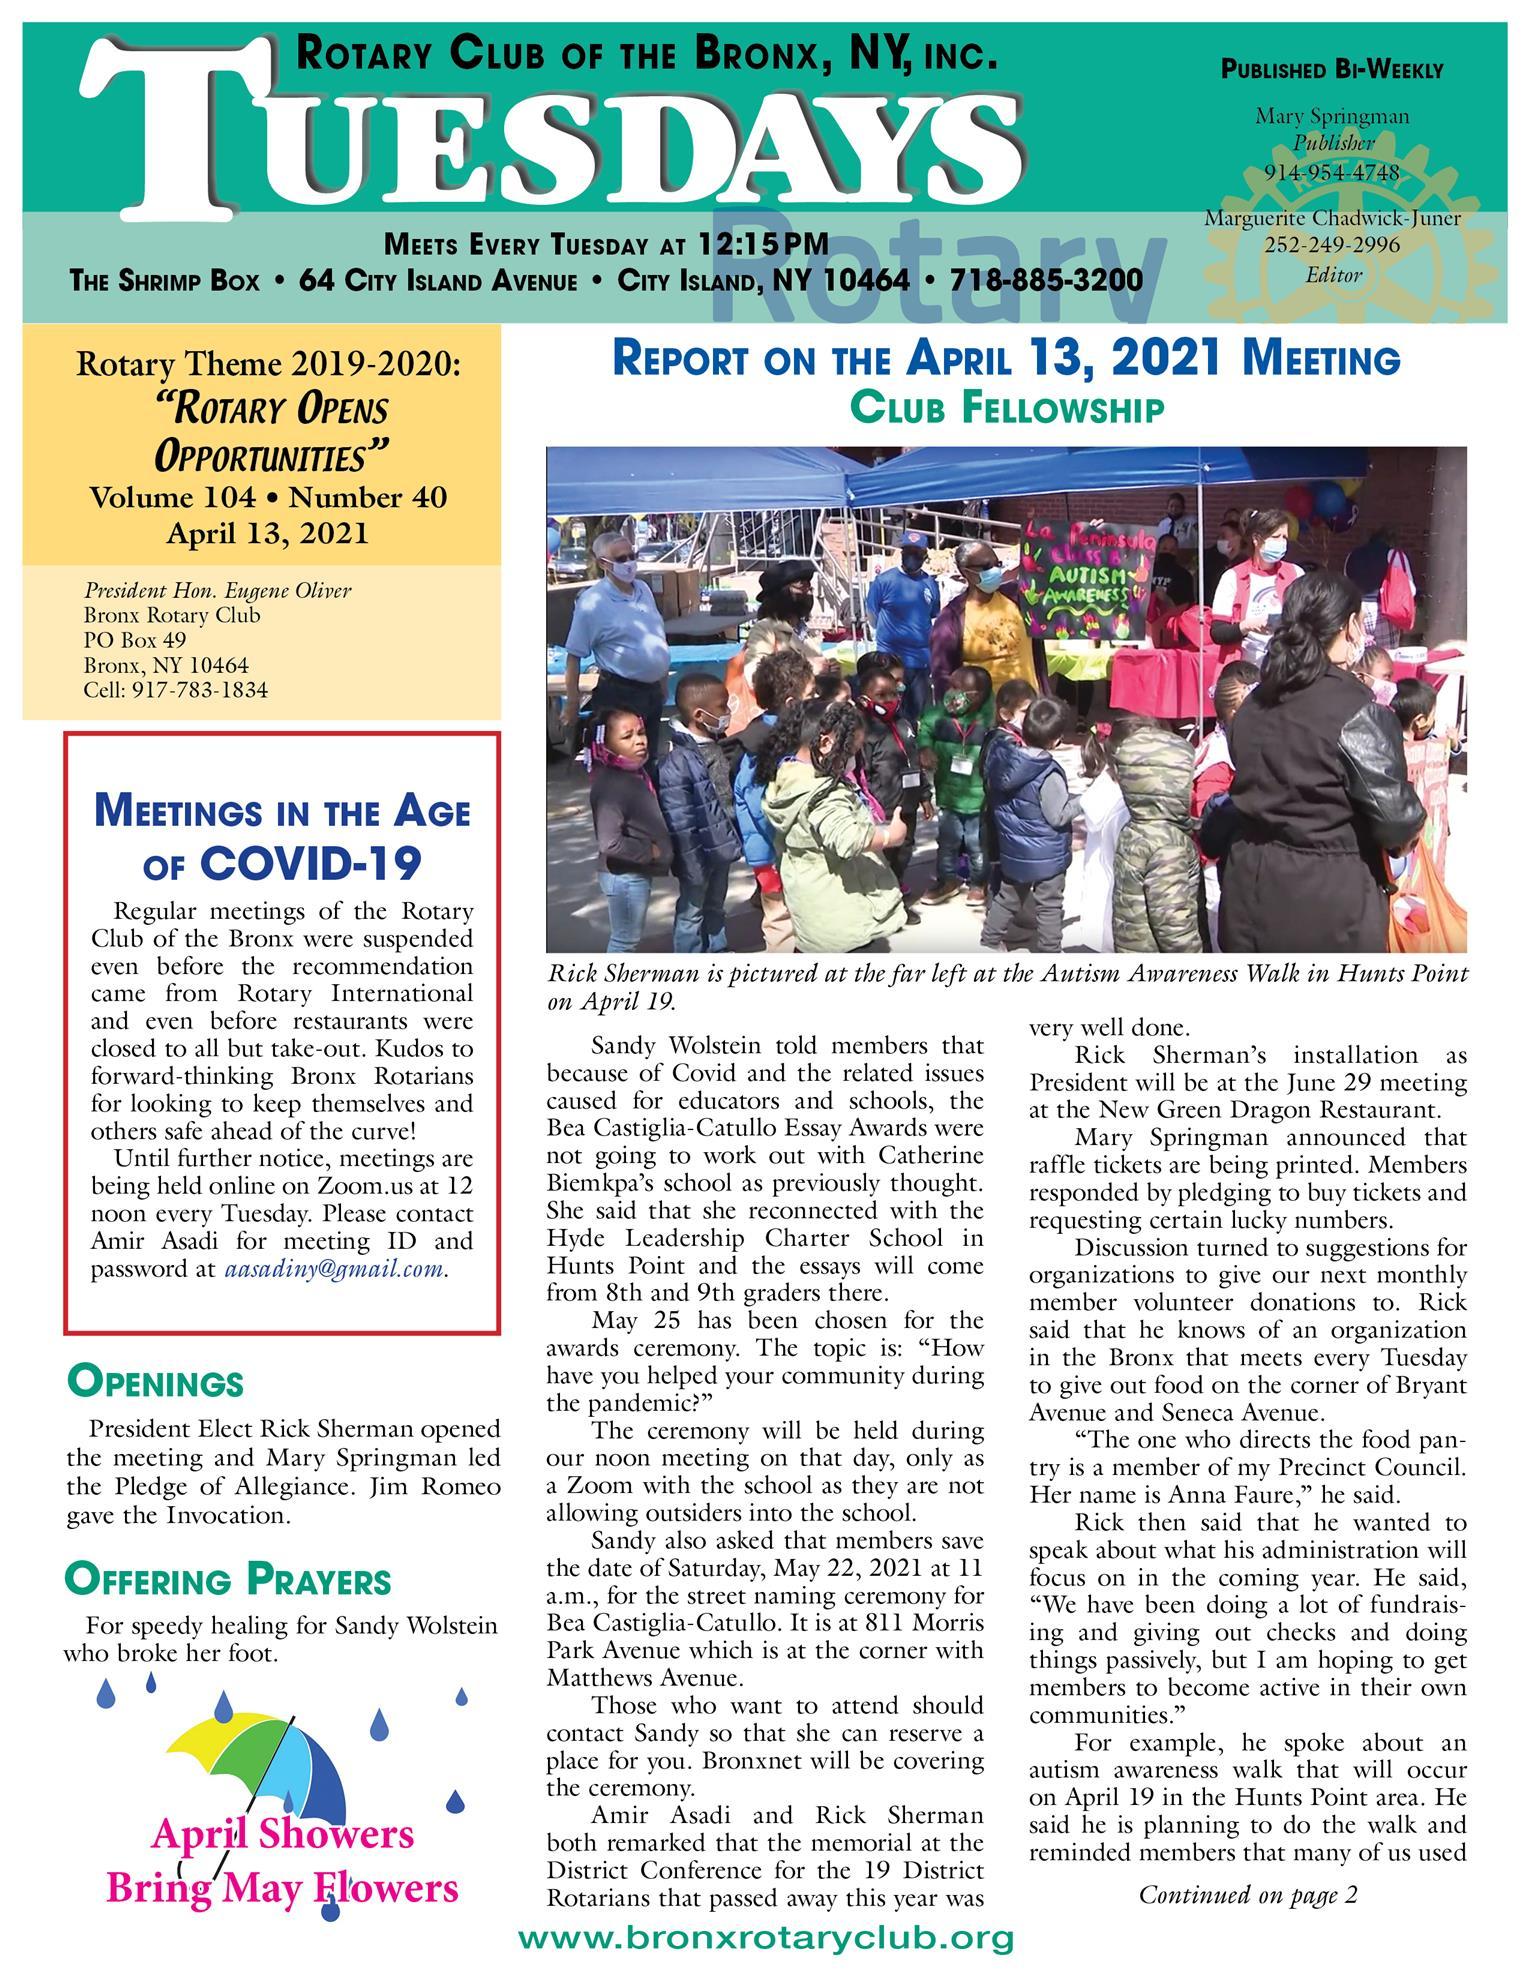 Tuesdays newsletter 4/13, 4/20 & 4/27/2021 p1